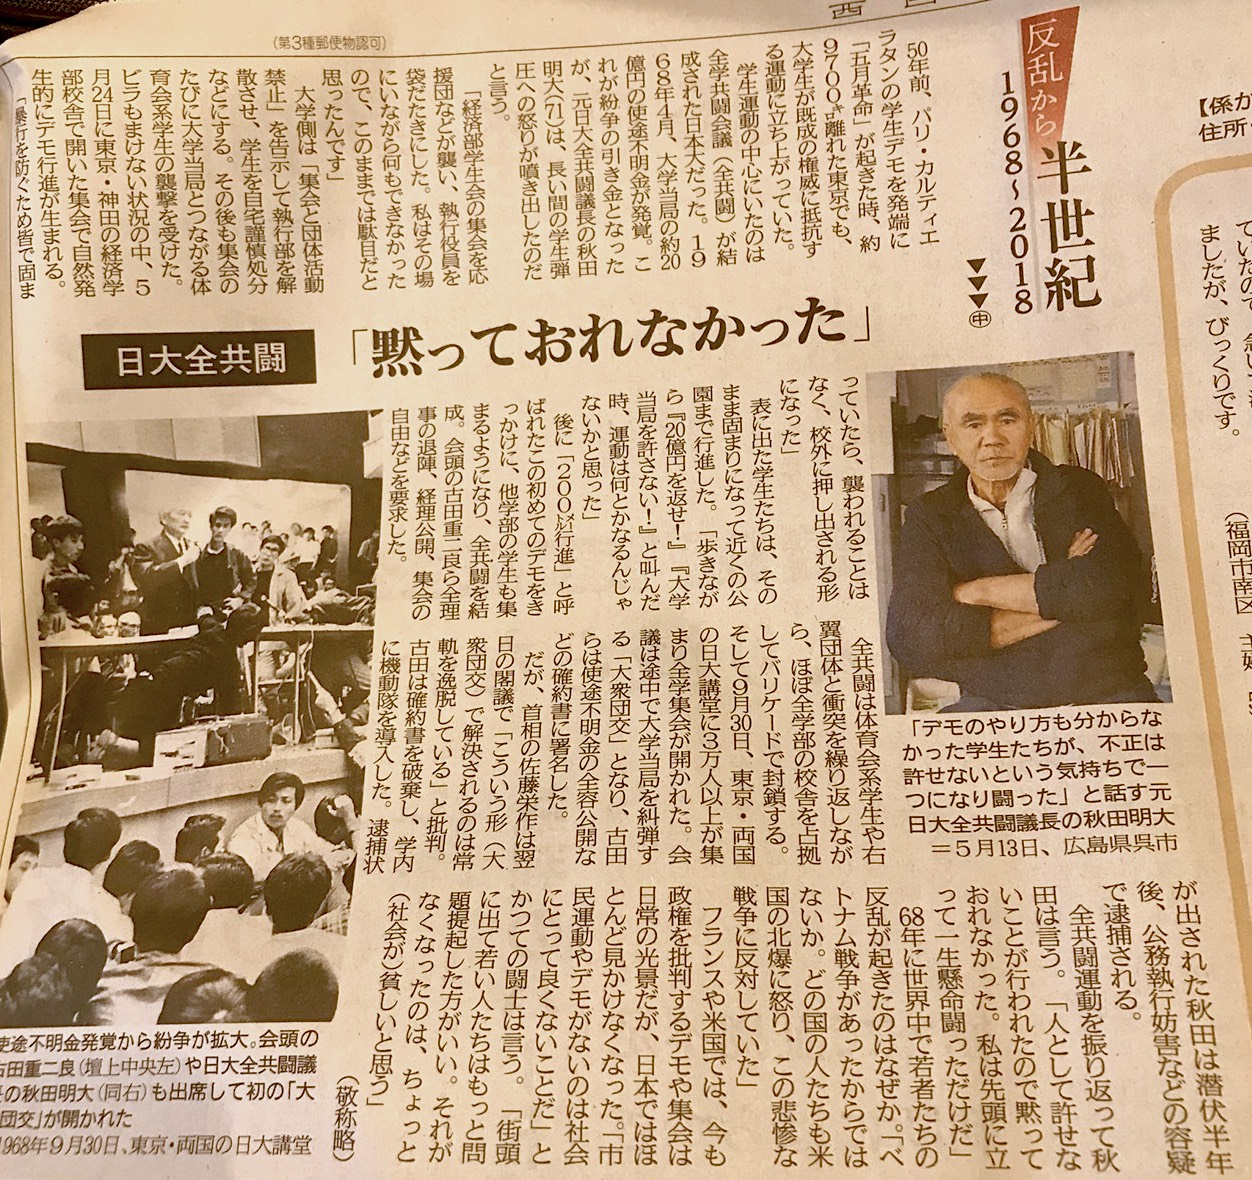 https://cdn-ak.f.st-hatena.com/images/fotolife/s/shioshiohida/20180606/20180606095233_original.jpg?1528246372